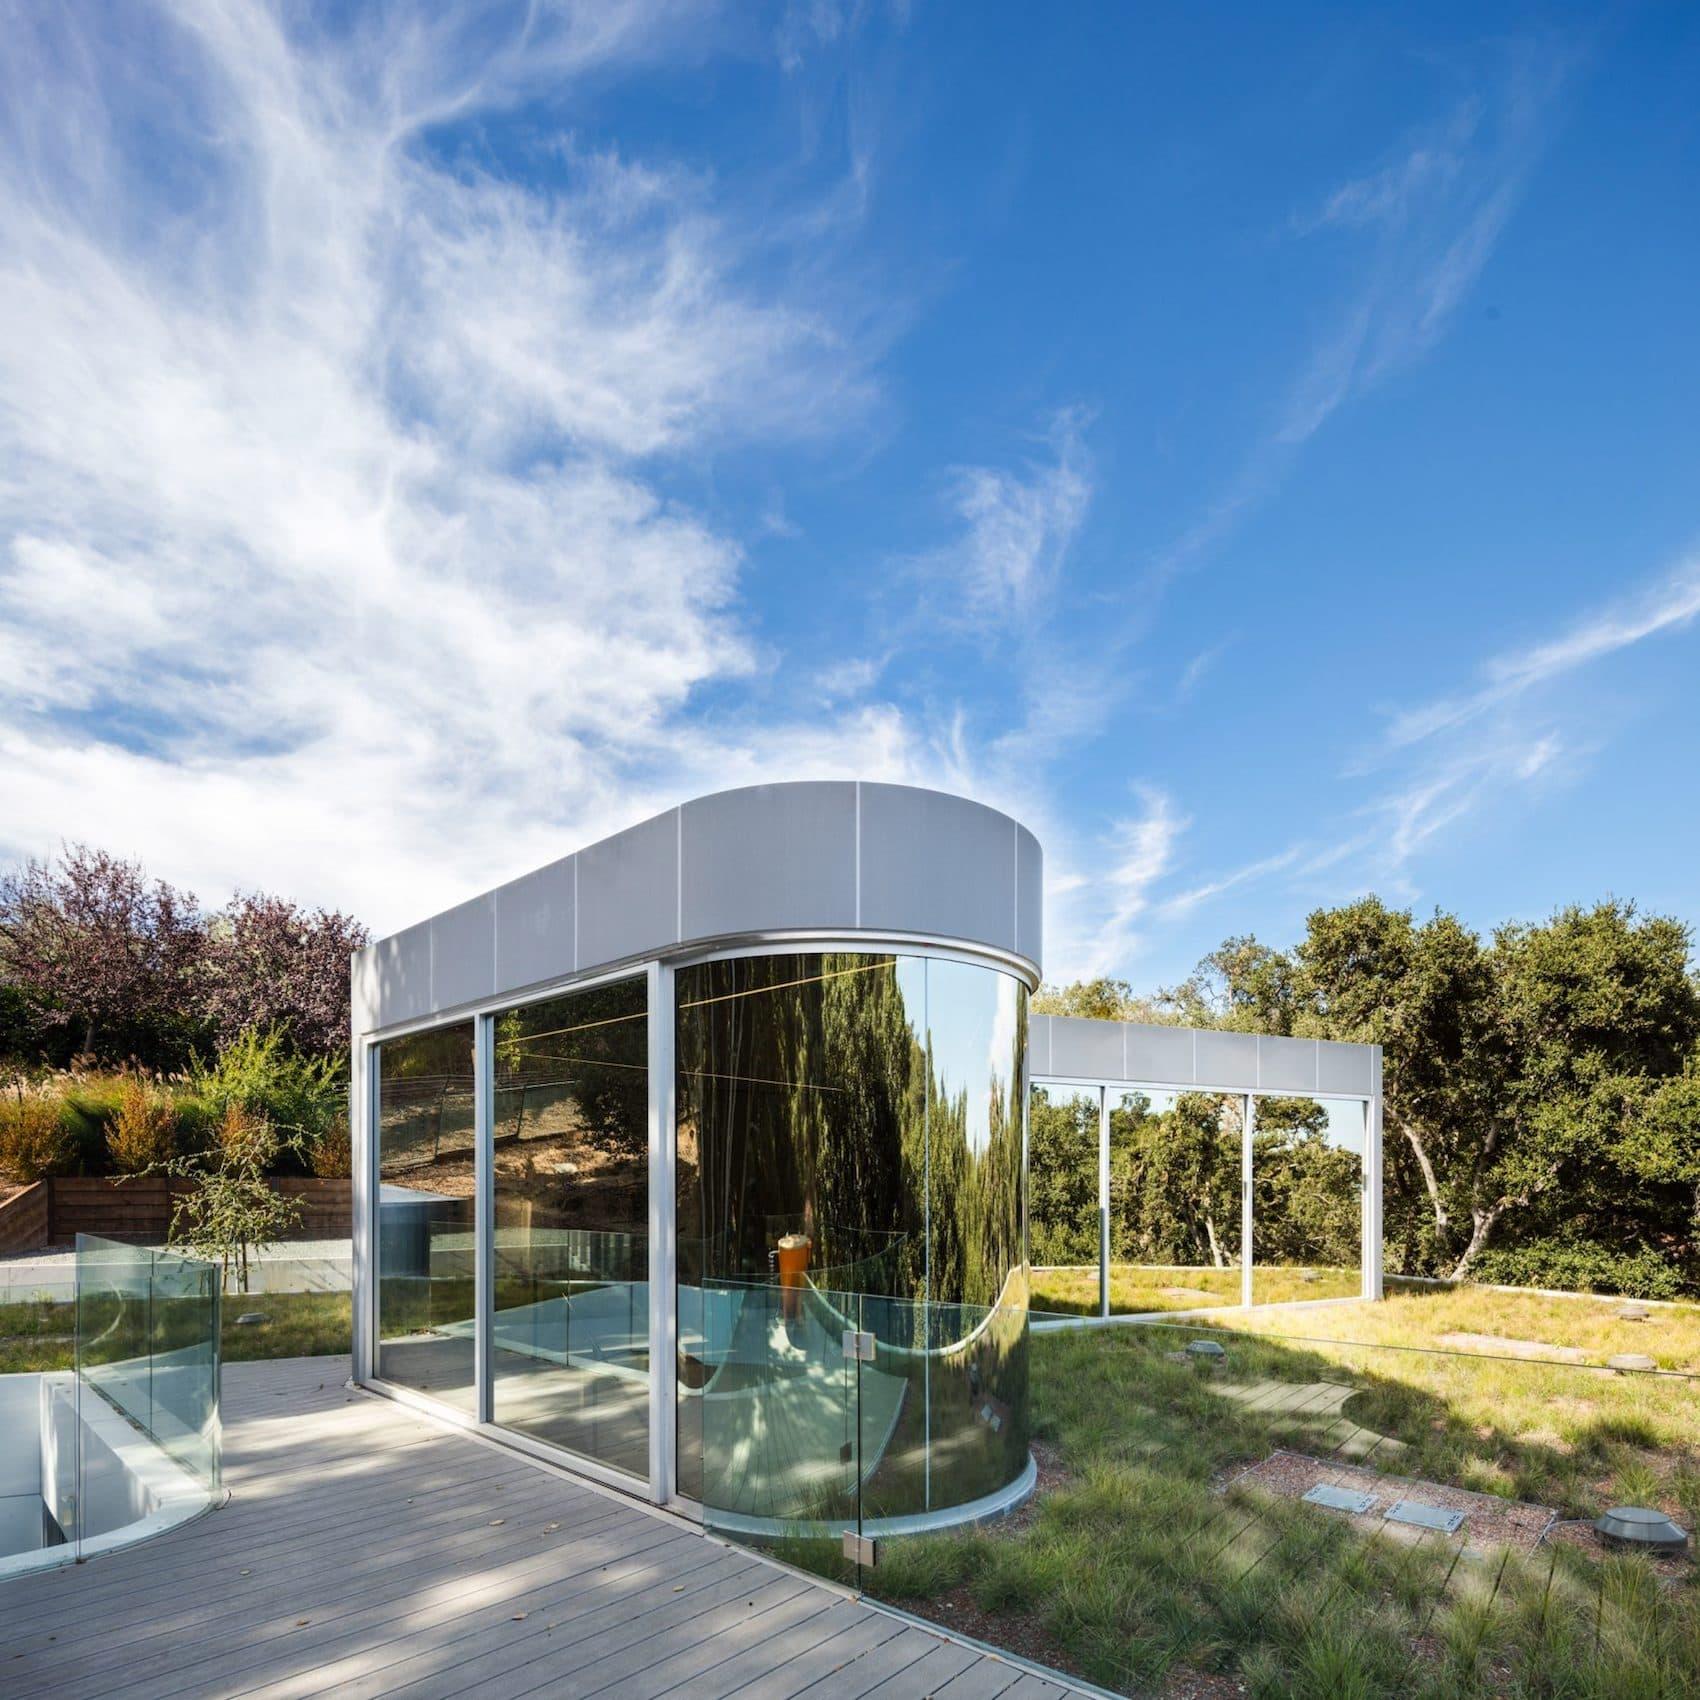 Licht ist Leben: Pam & Paul's House by Craig Steely Architecture 4